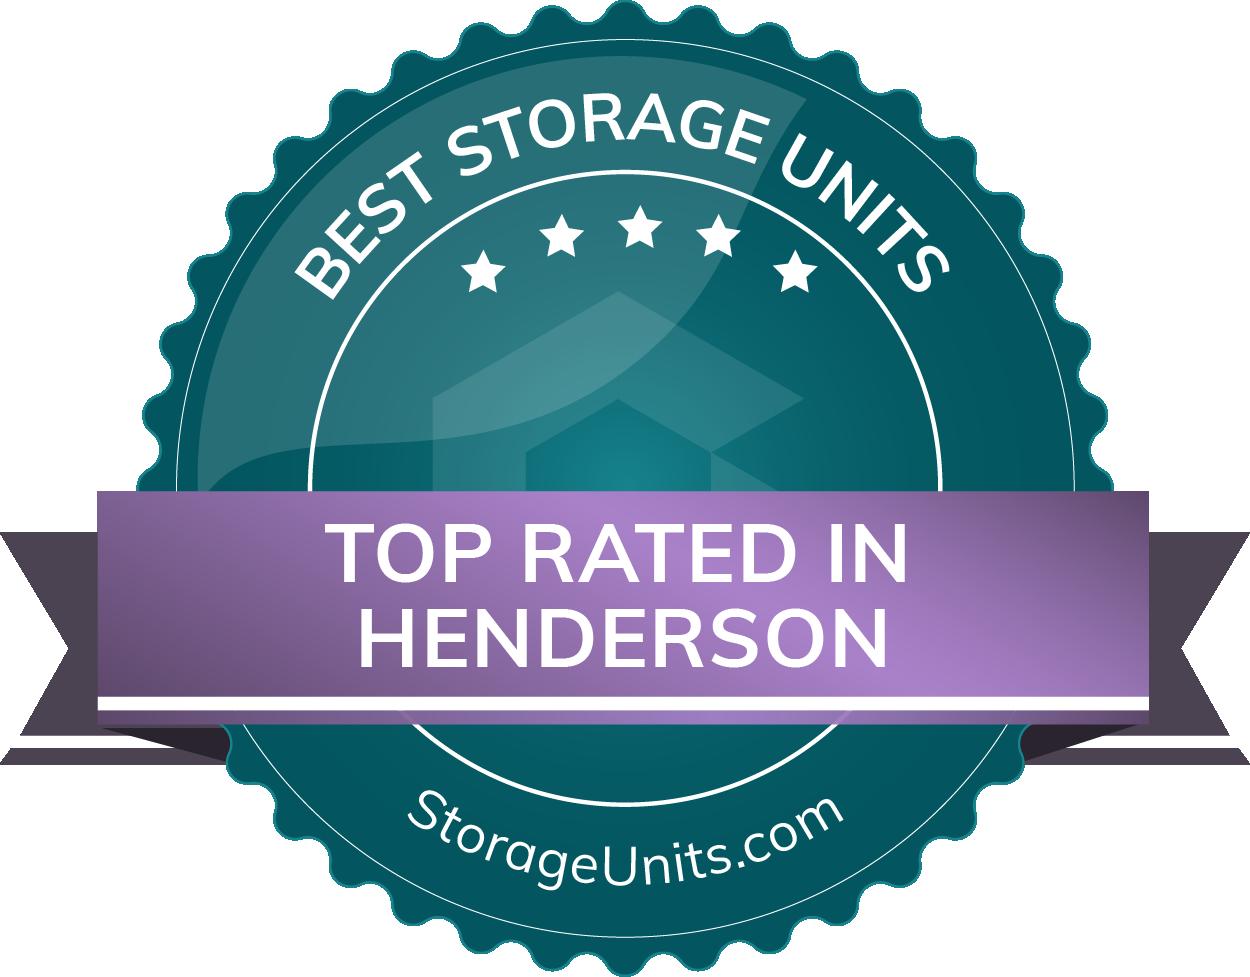 Best Self Storage Units in Henderson, NV